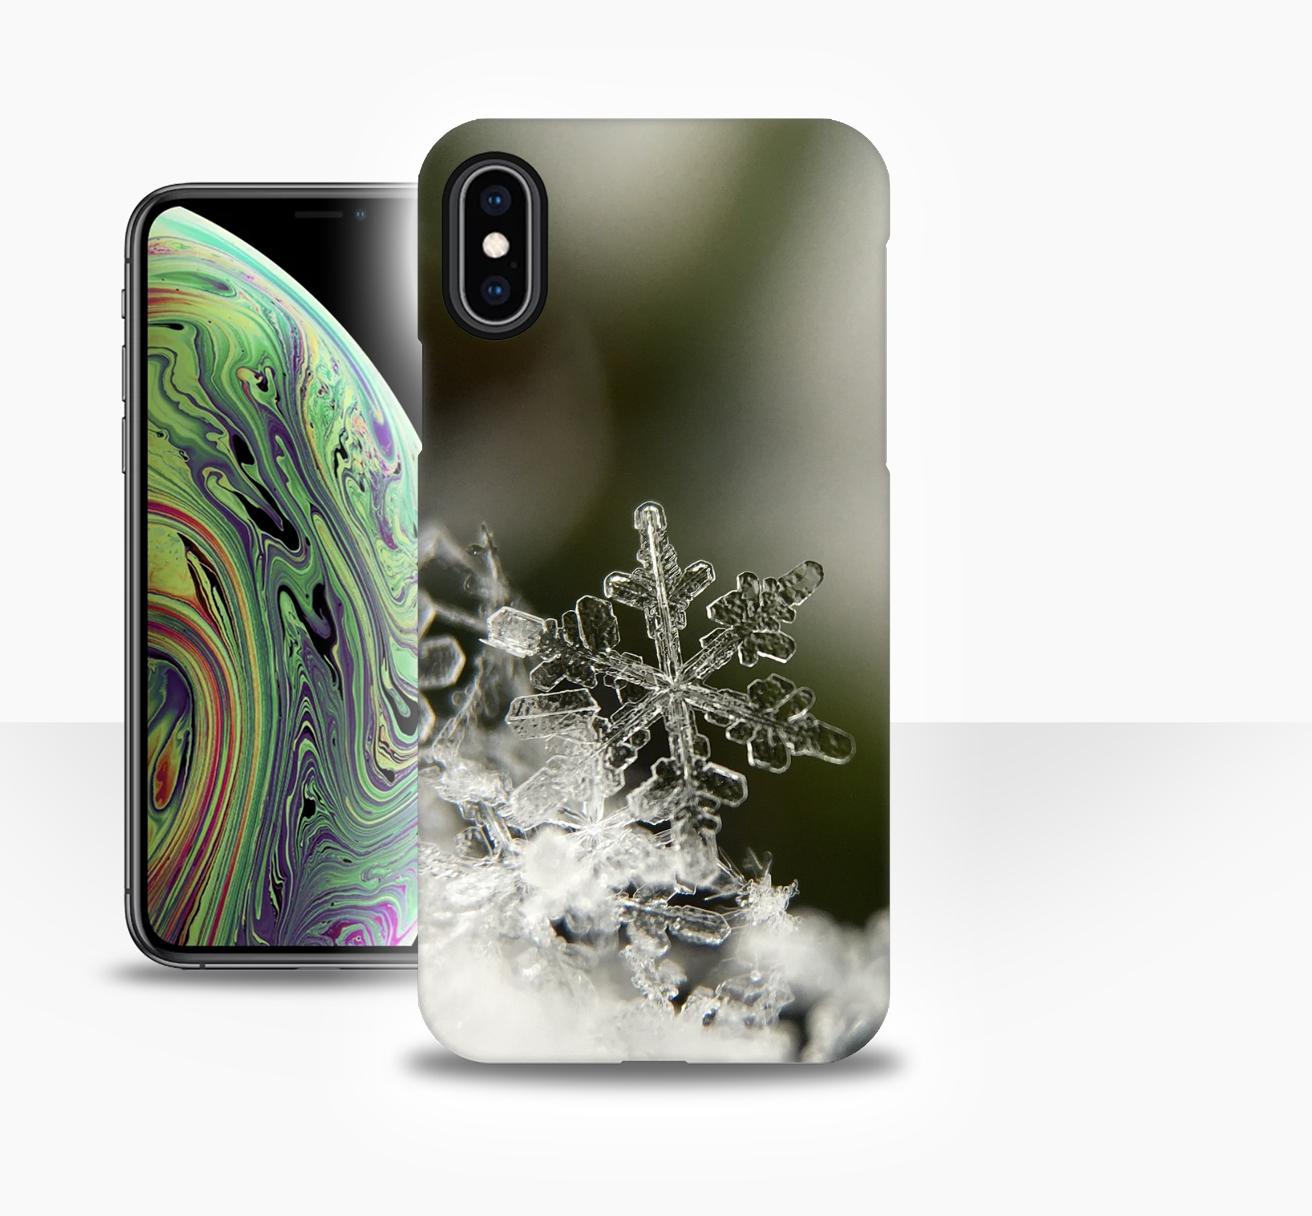 Stylový kryt na iPhoneXS - MyCase